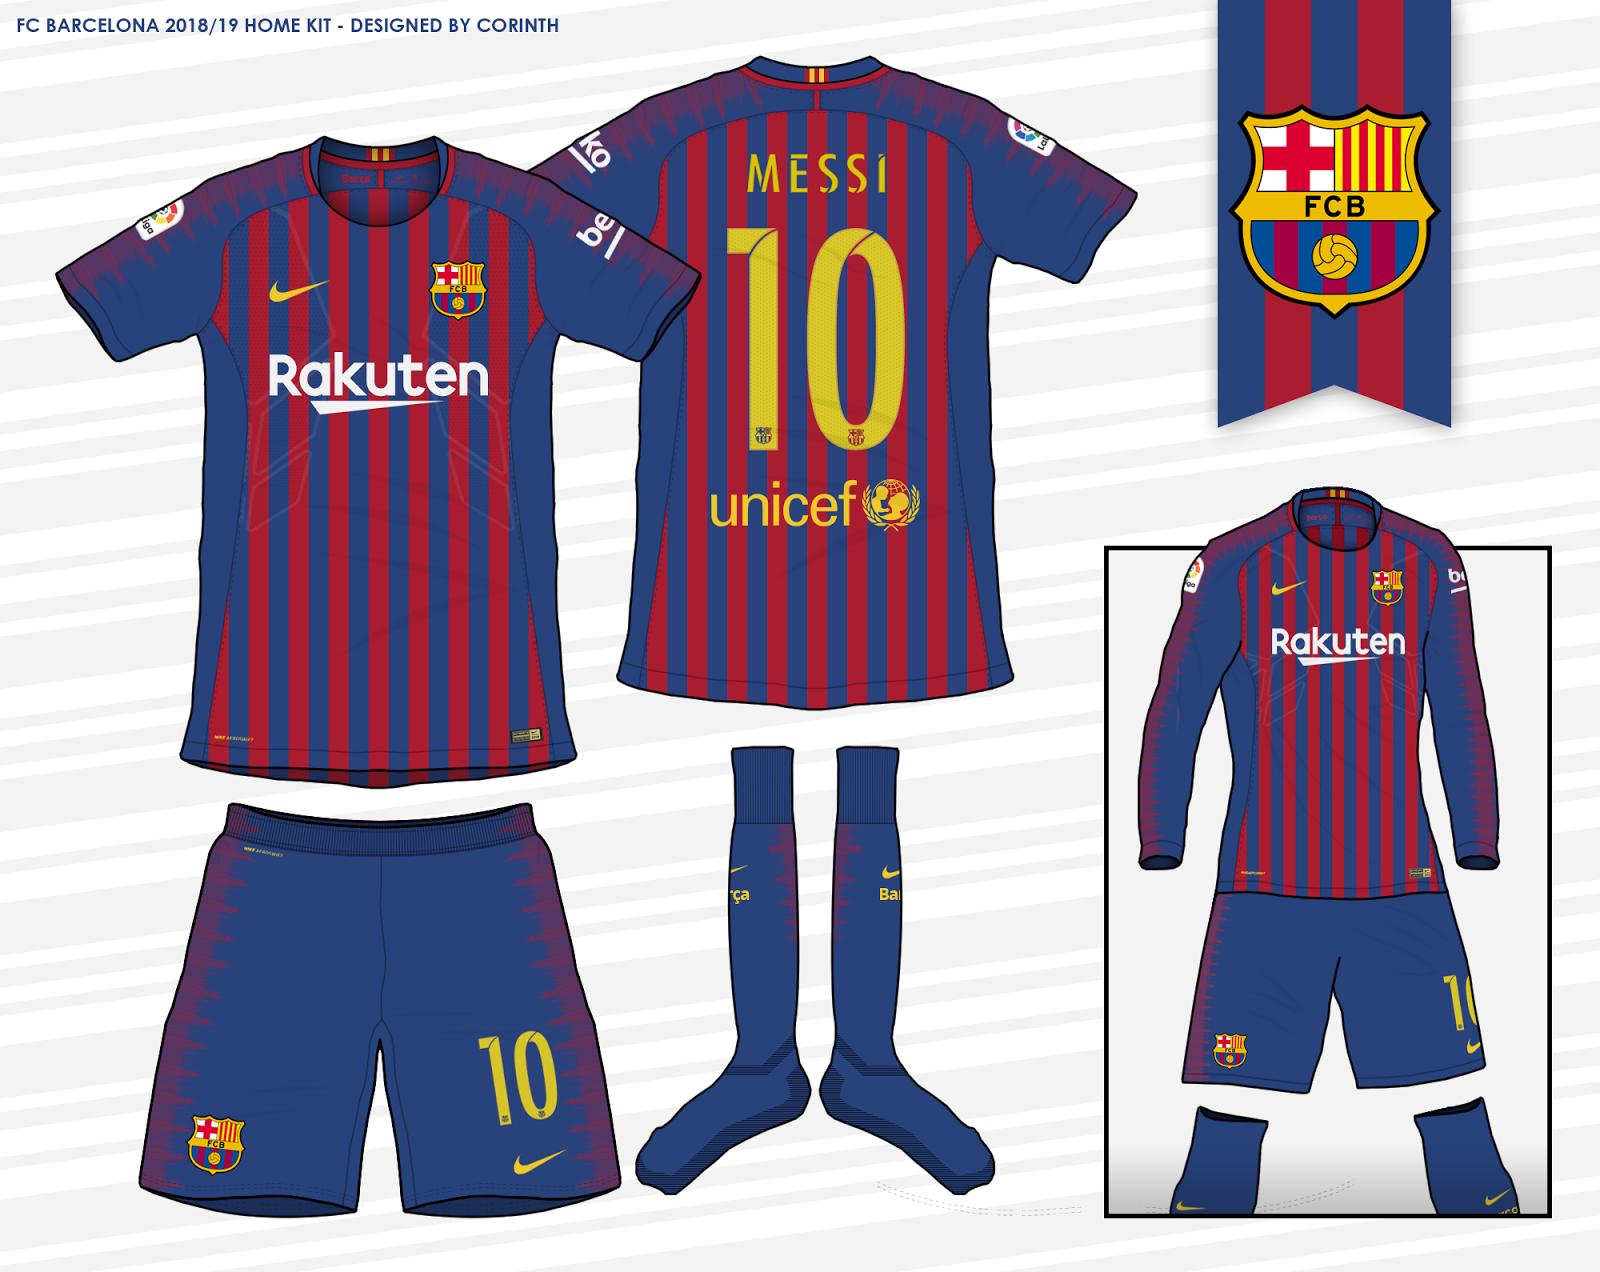 5929125cd Barcelona 2018 19 Home Kit according to leaks